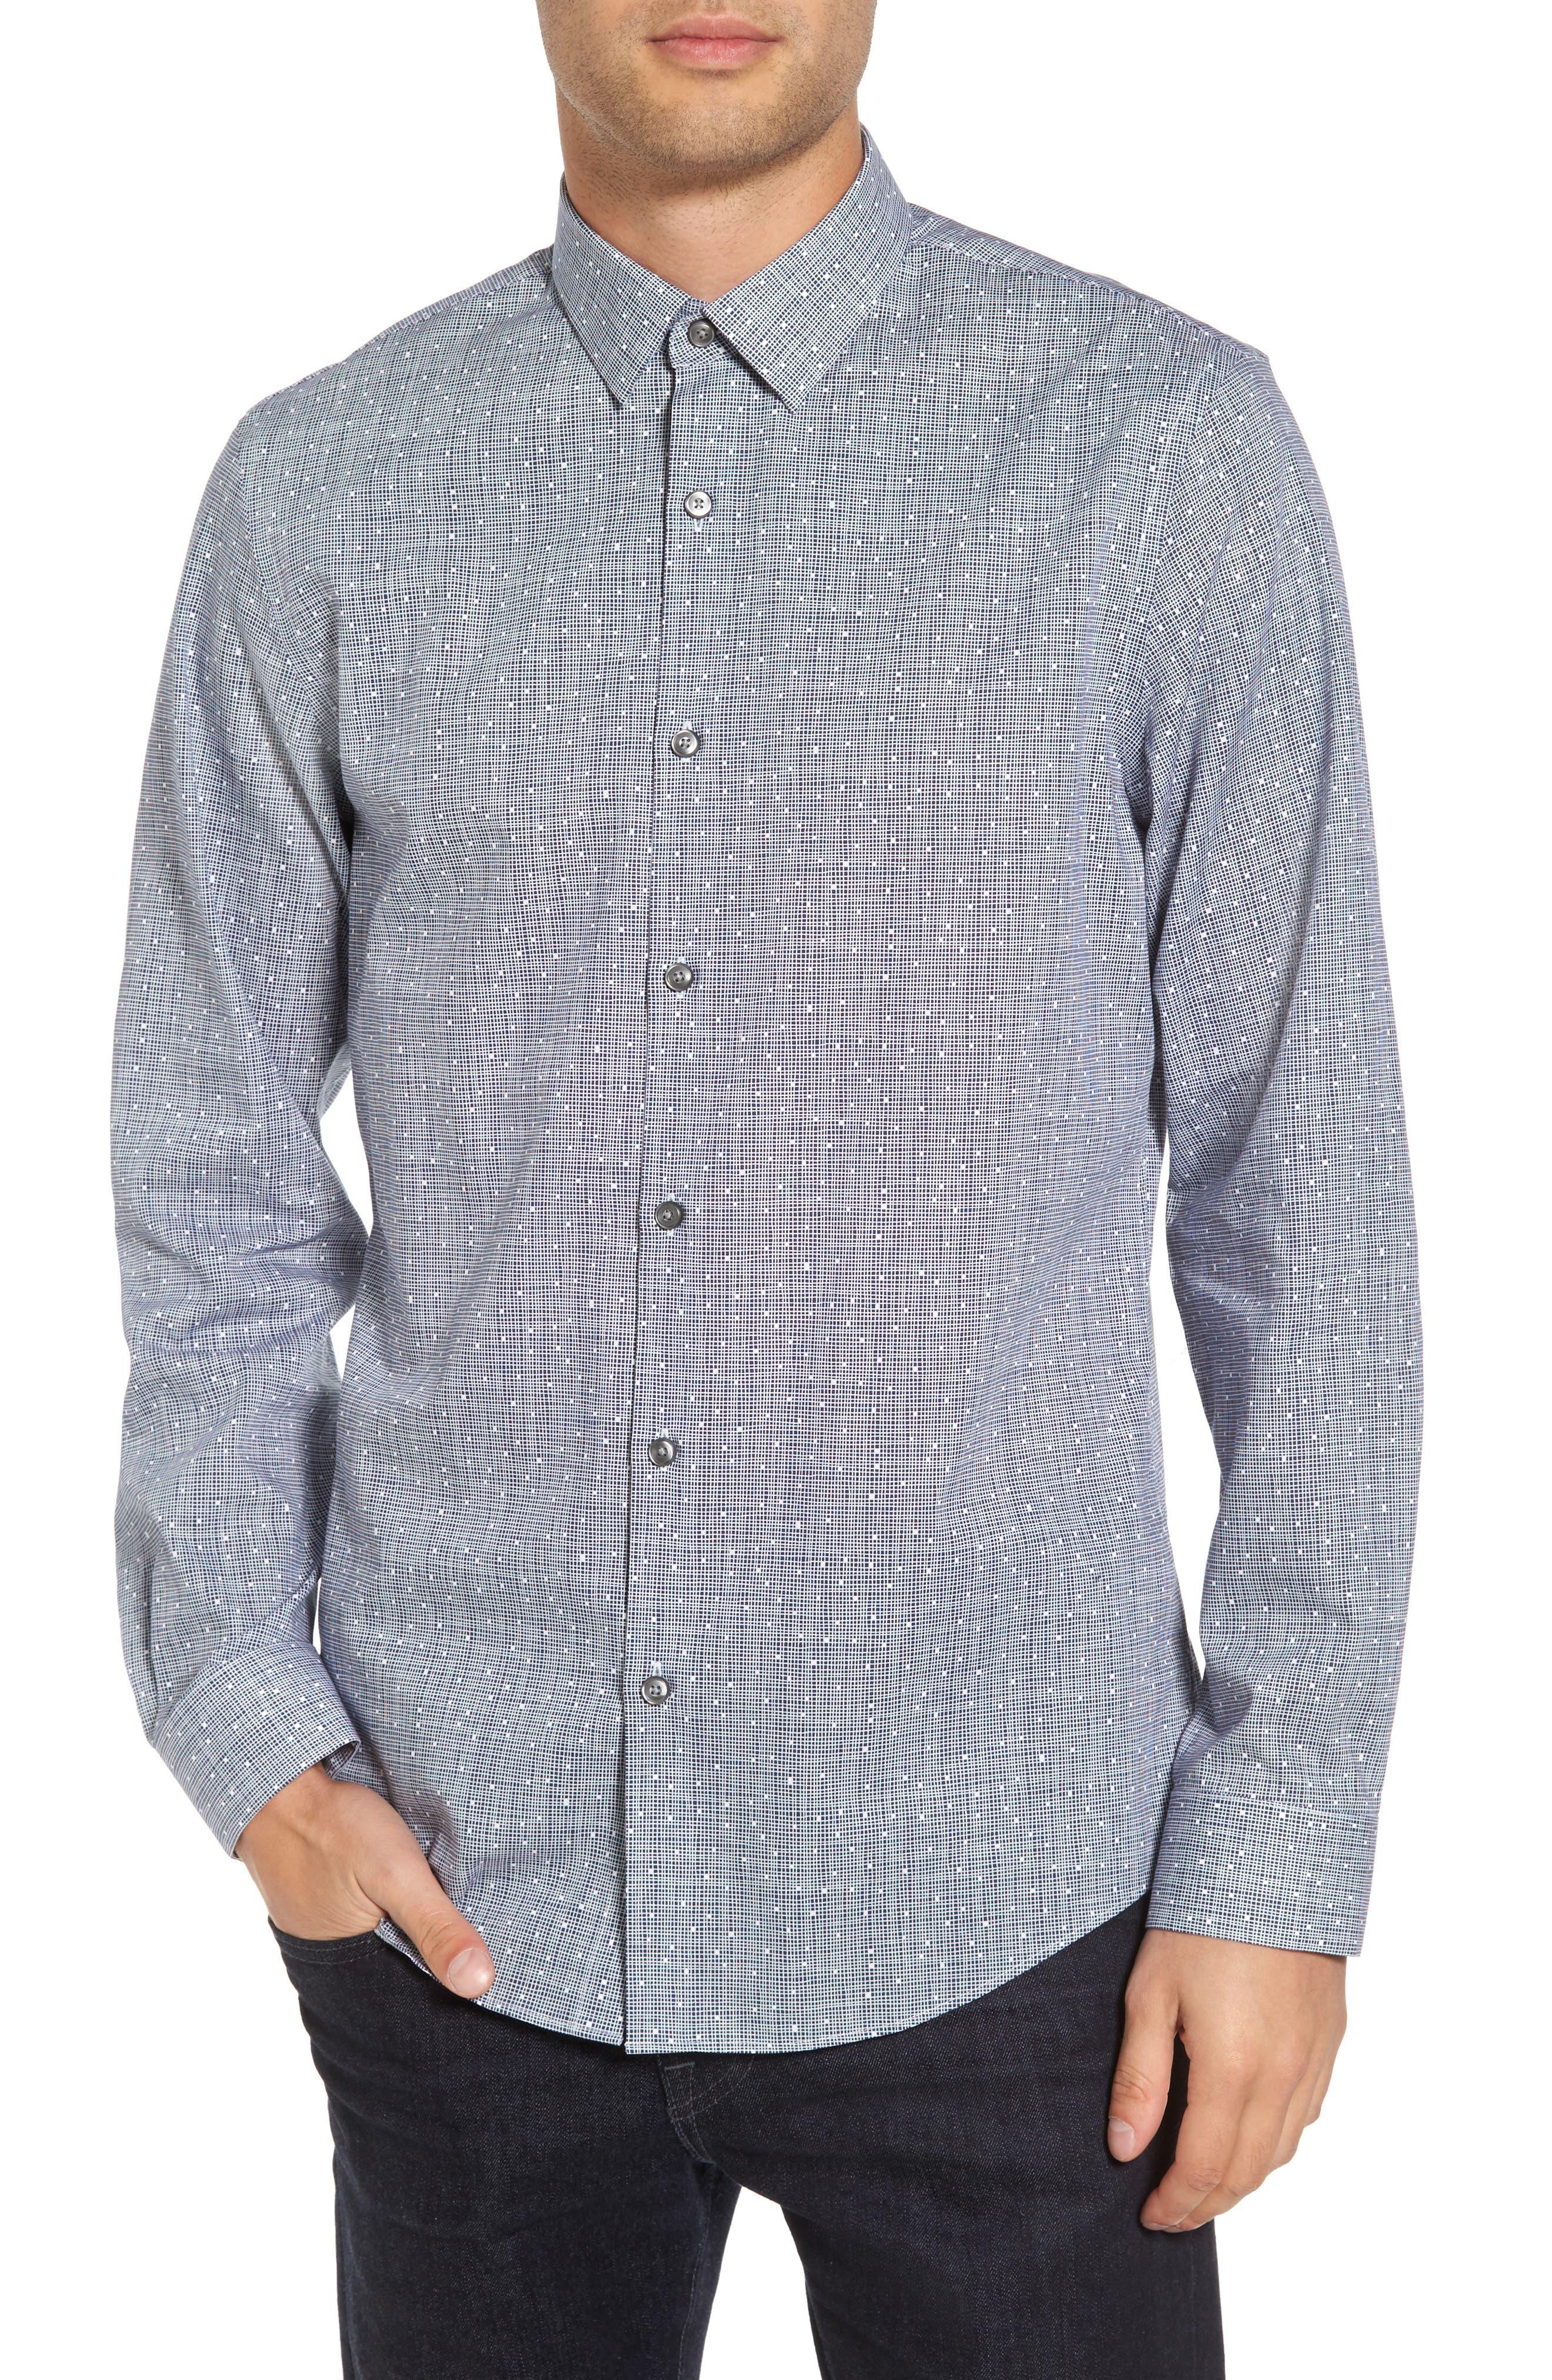 Alternate Image 1 Selected - Calibrate Slim Fit No-Iron Print Sport Shirt